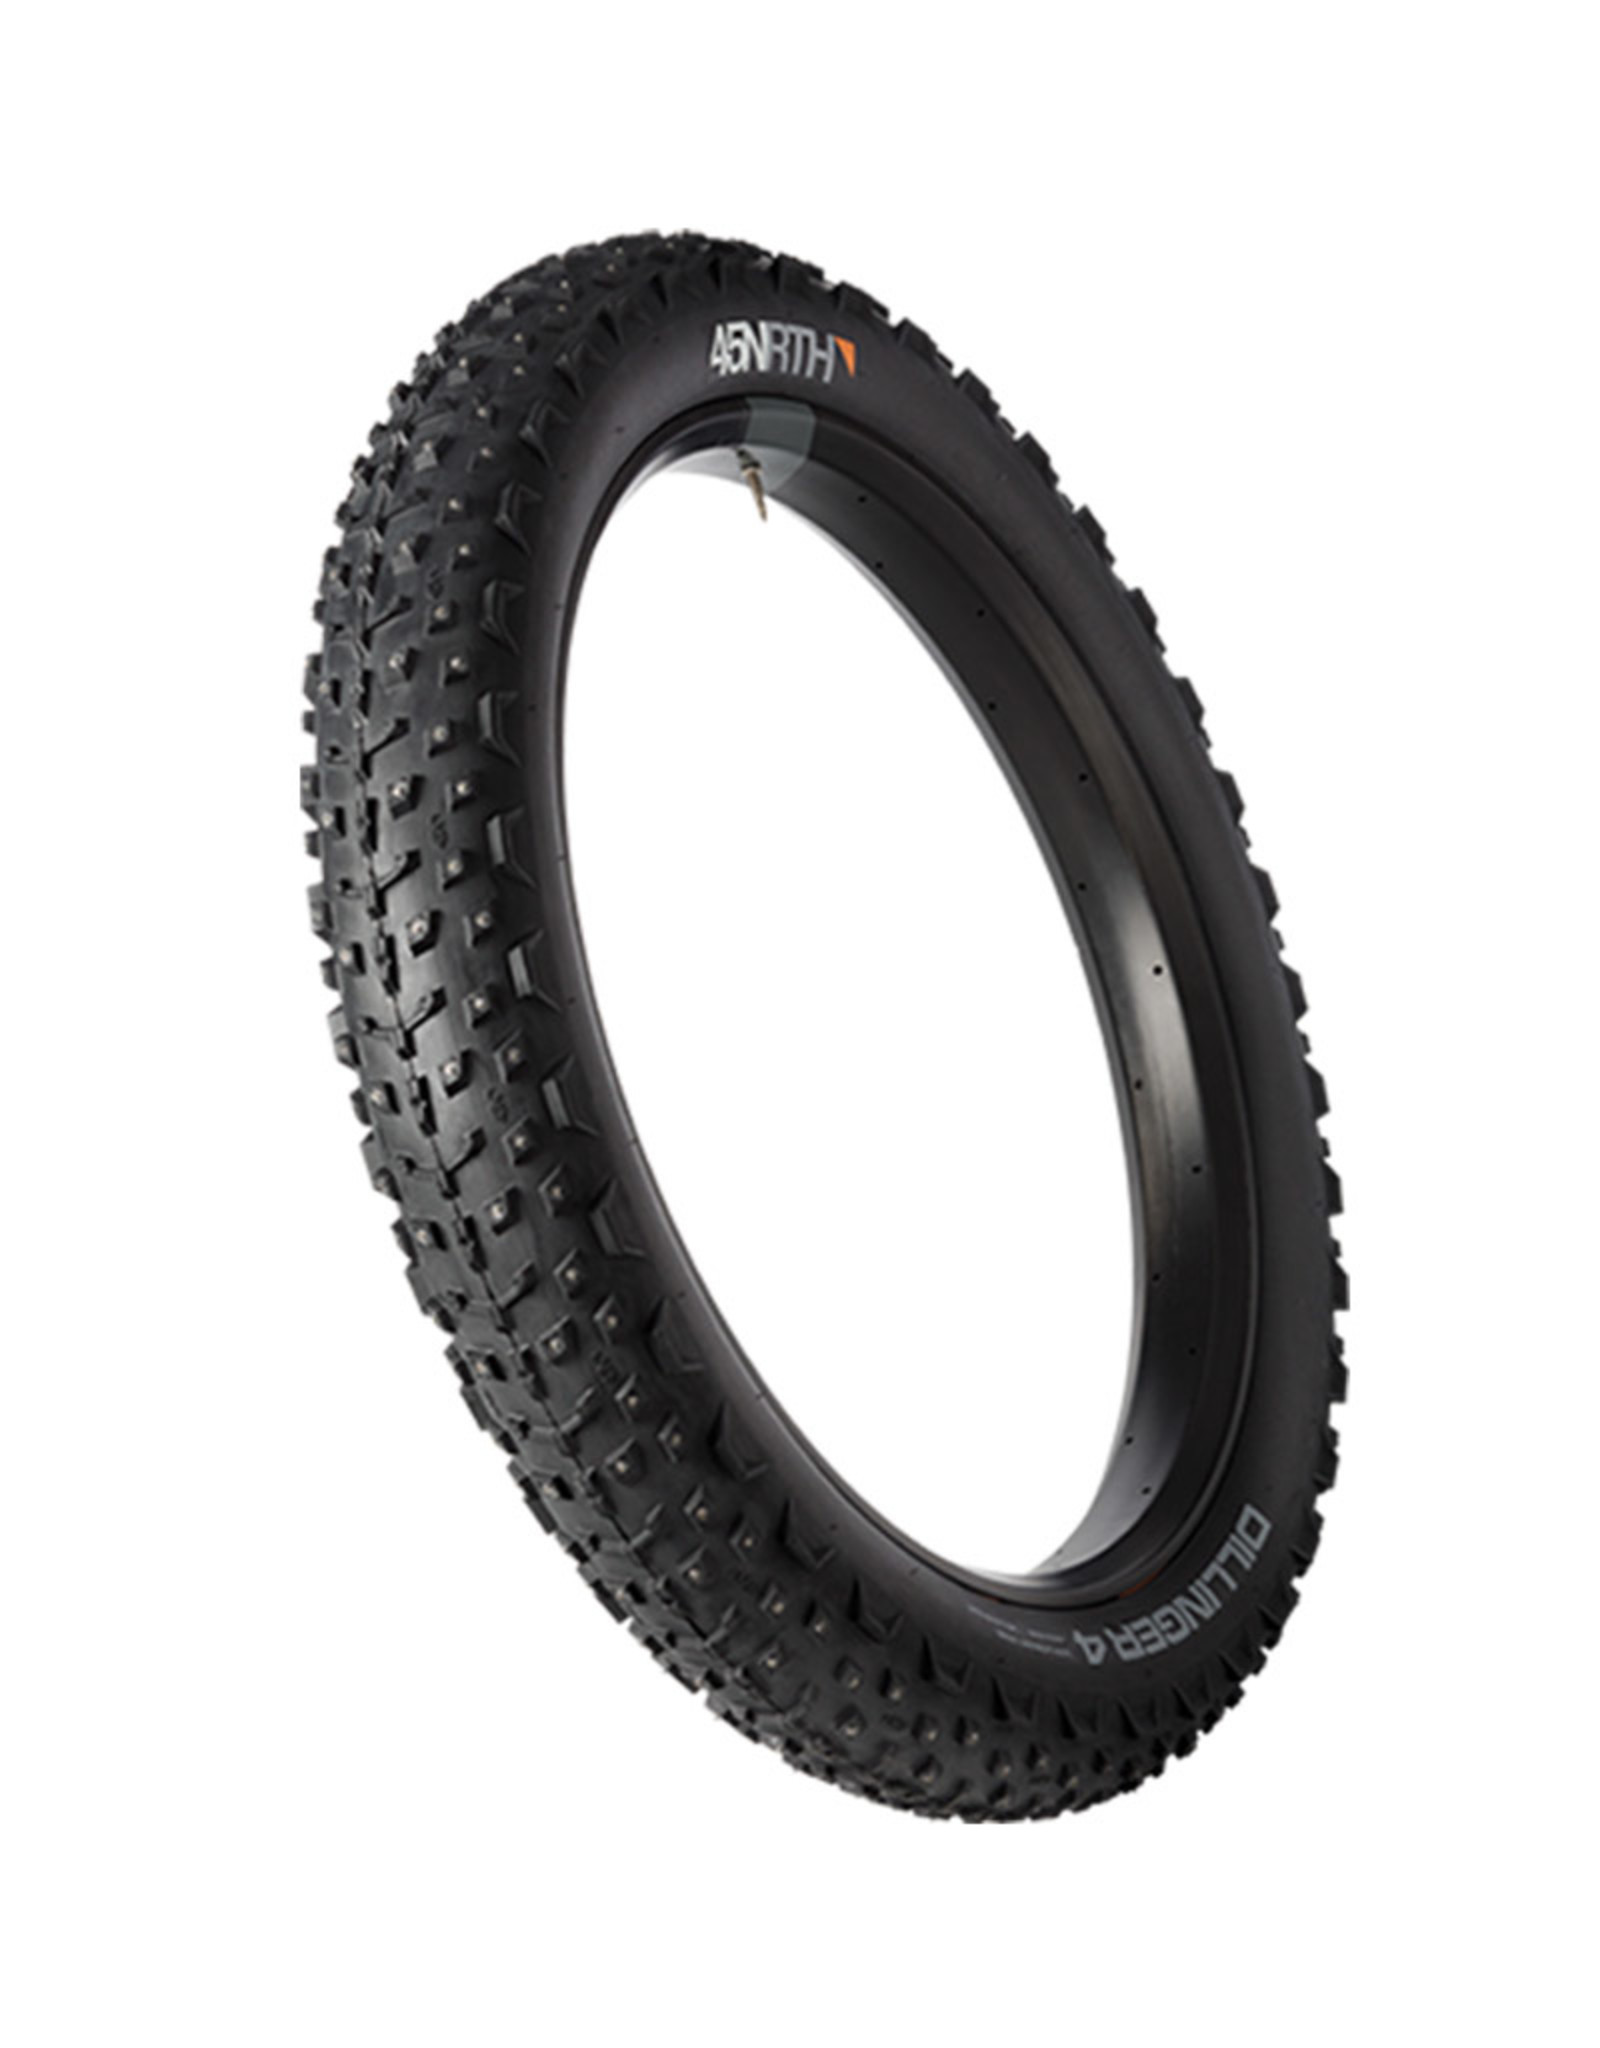 45NRTH 45NRTH Dillinger 4 Tire - 26 x 4, Tubeless, Folding, Black, 120tpi, 240 Concave Carbide Aluminum Studs